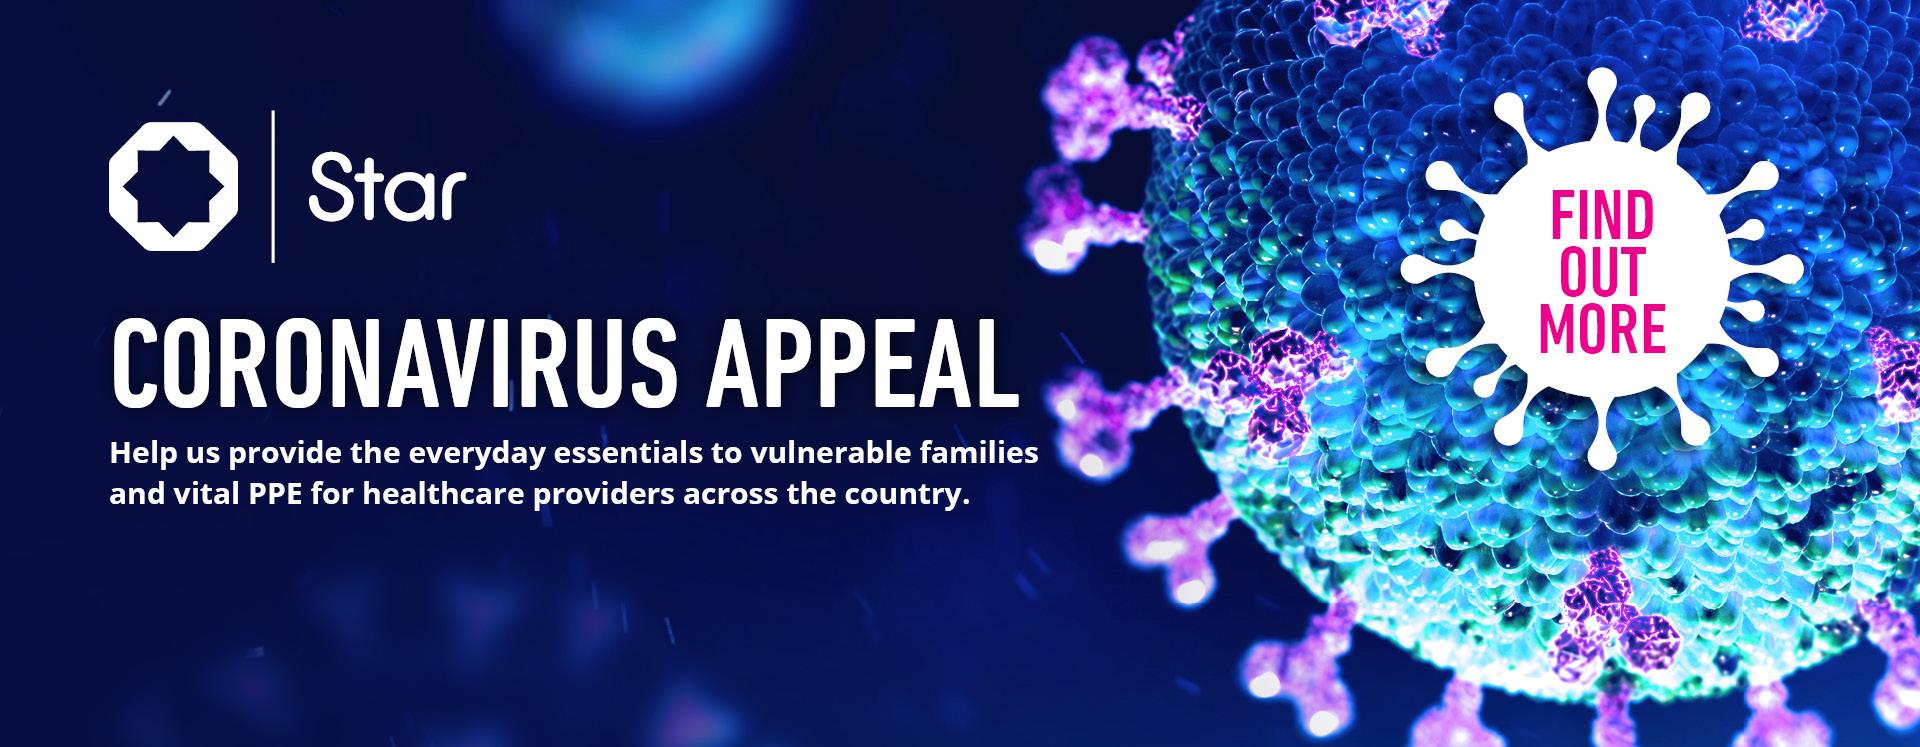 Corona Virus Appeal